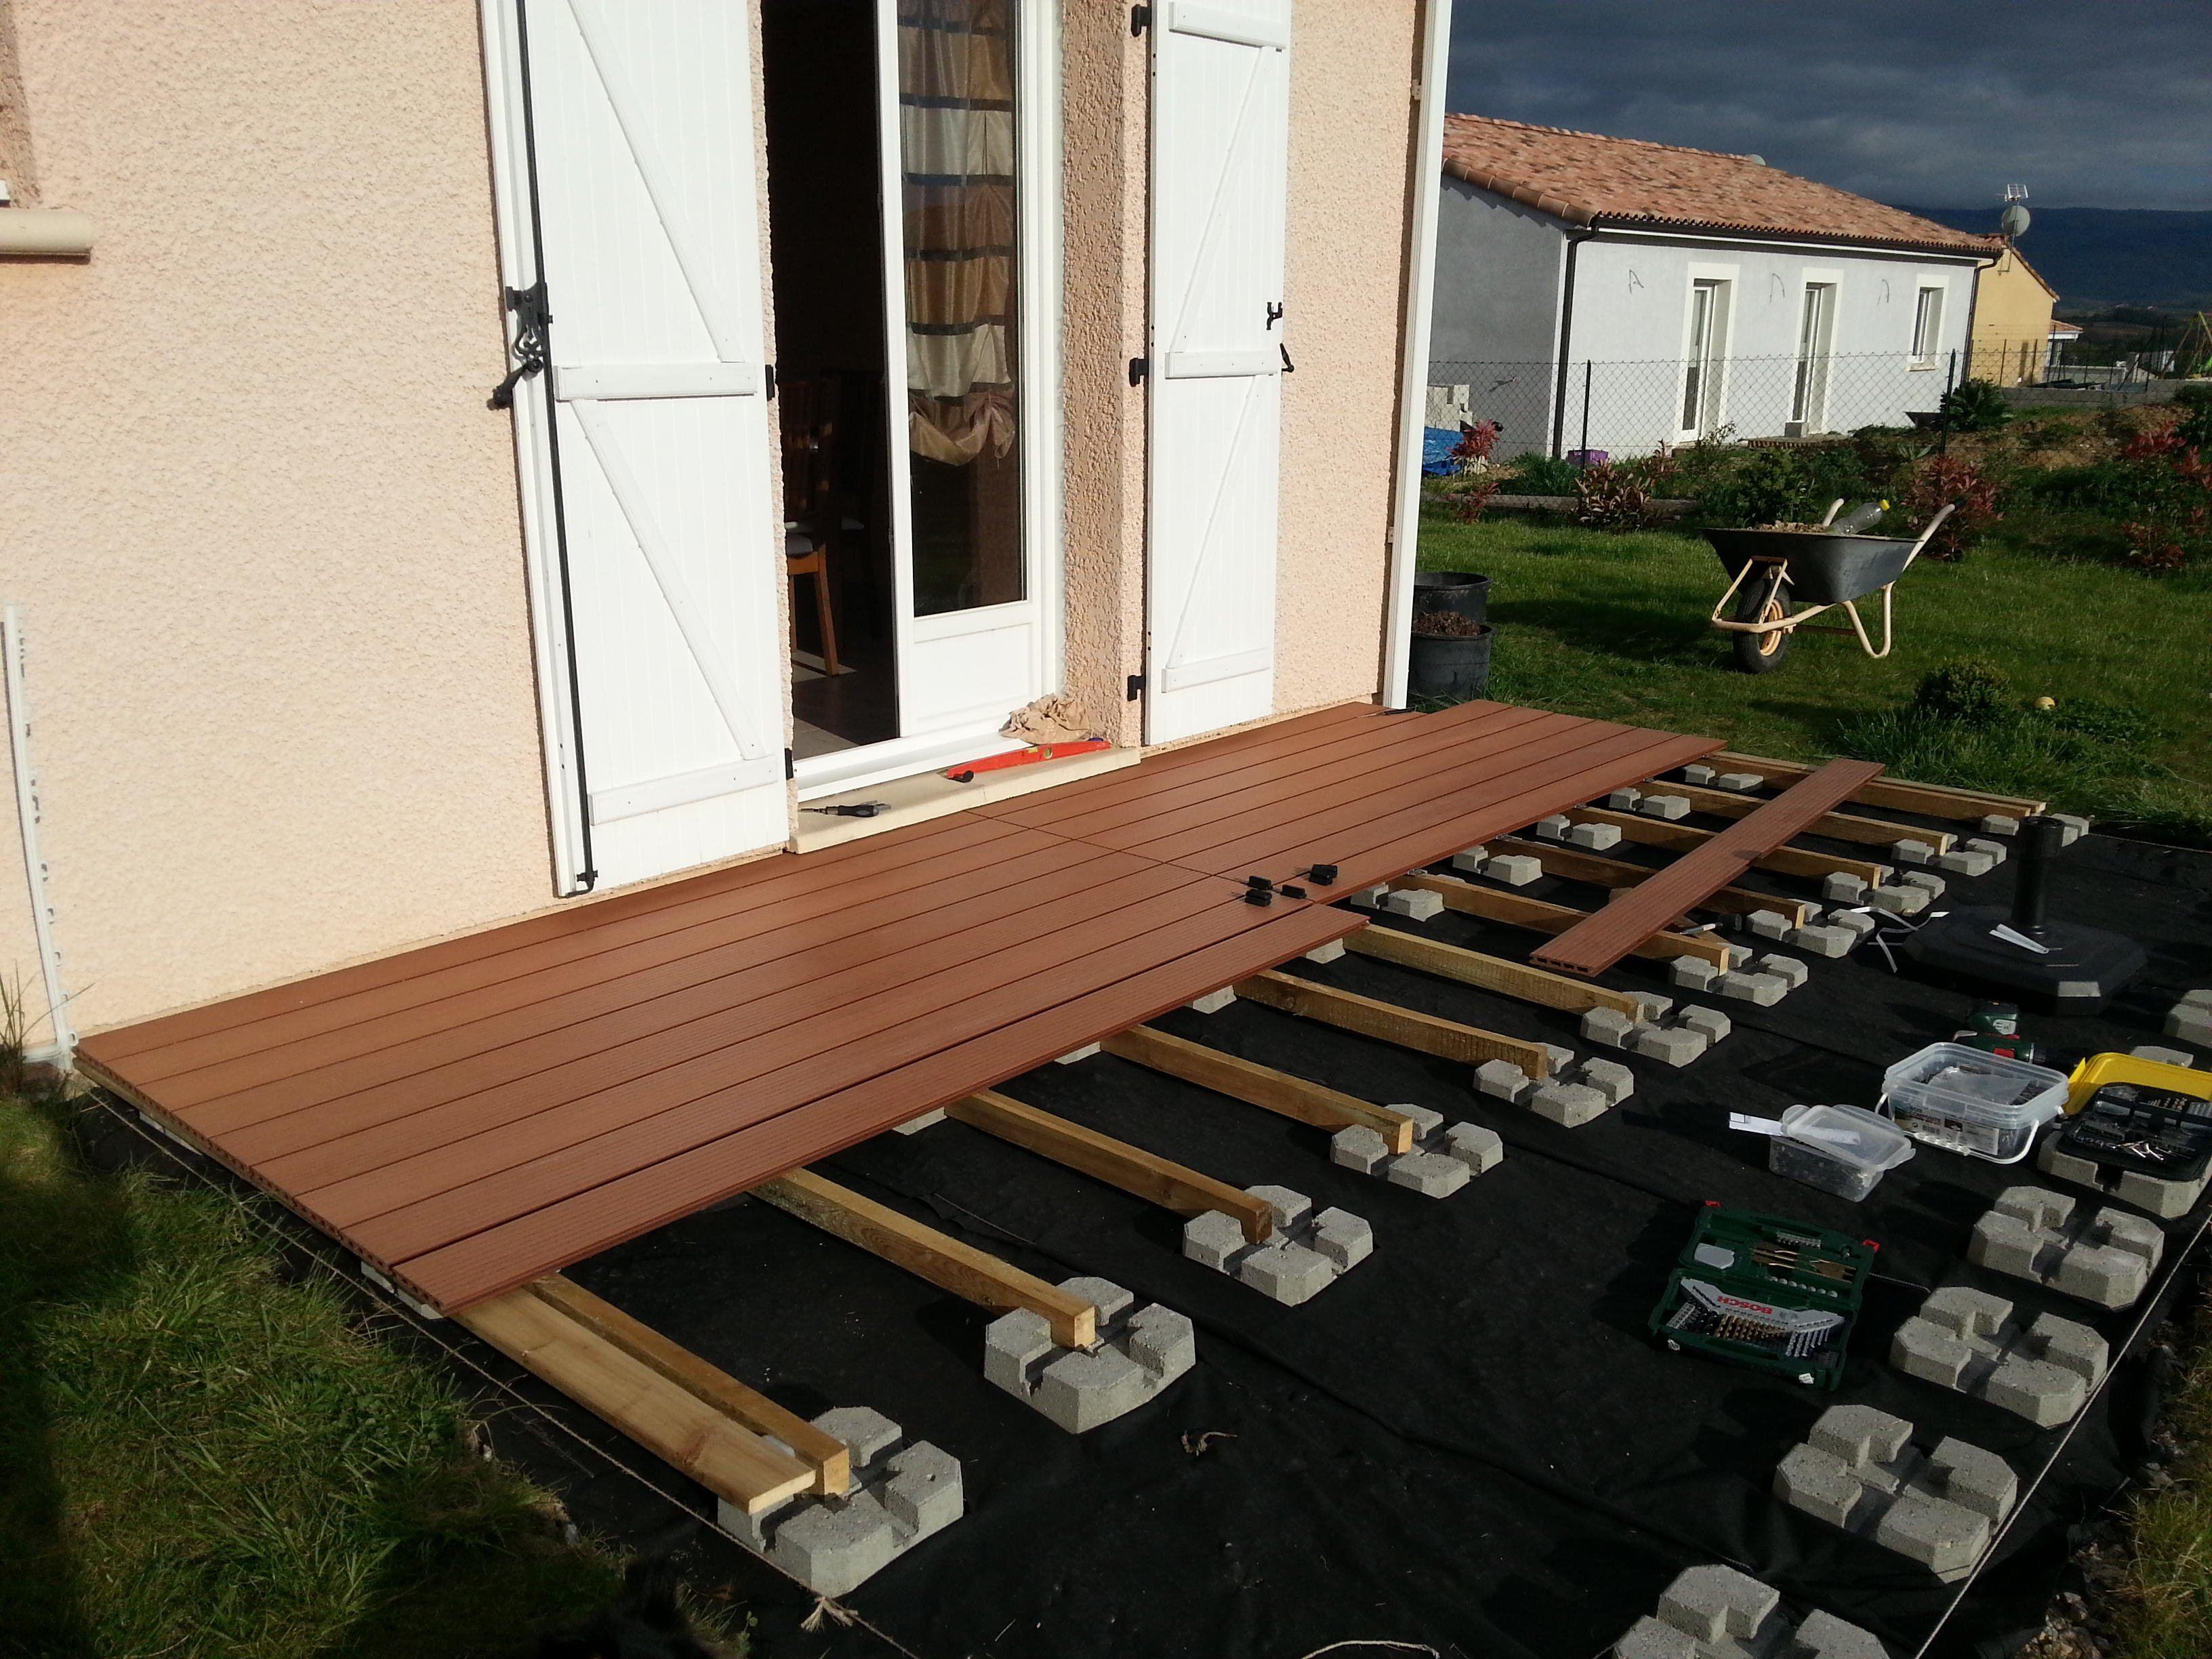 Genial Faire Une Terrasse A Moindre Cout